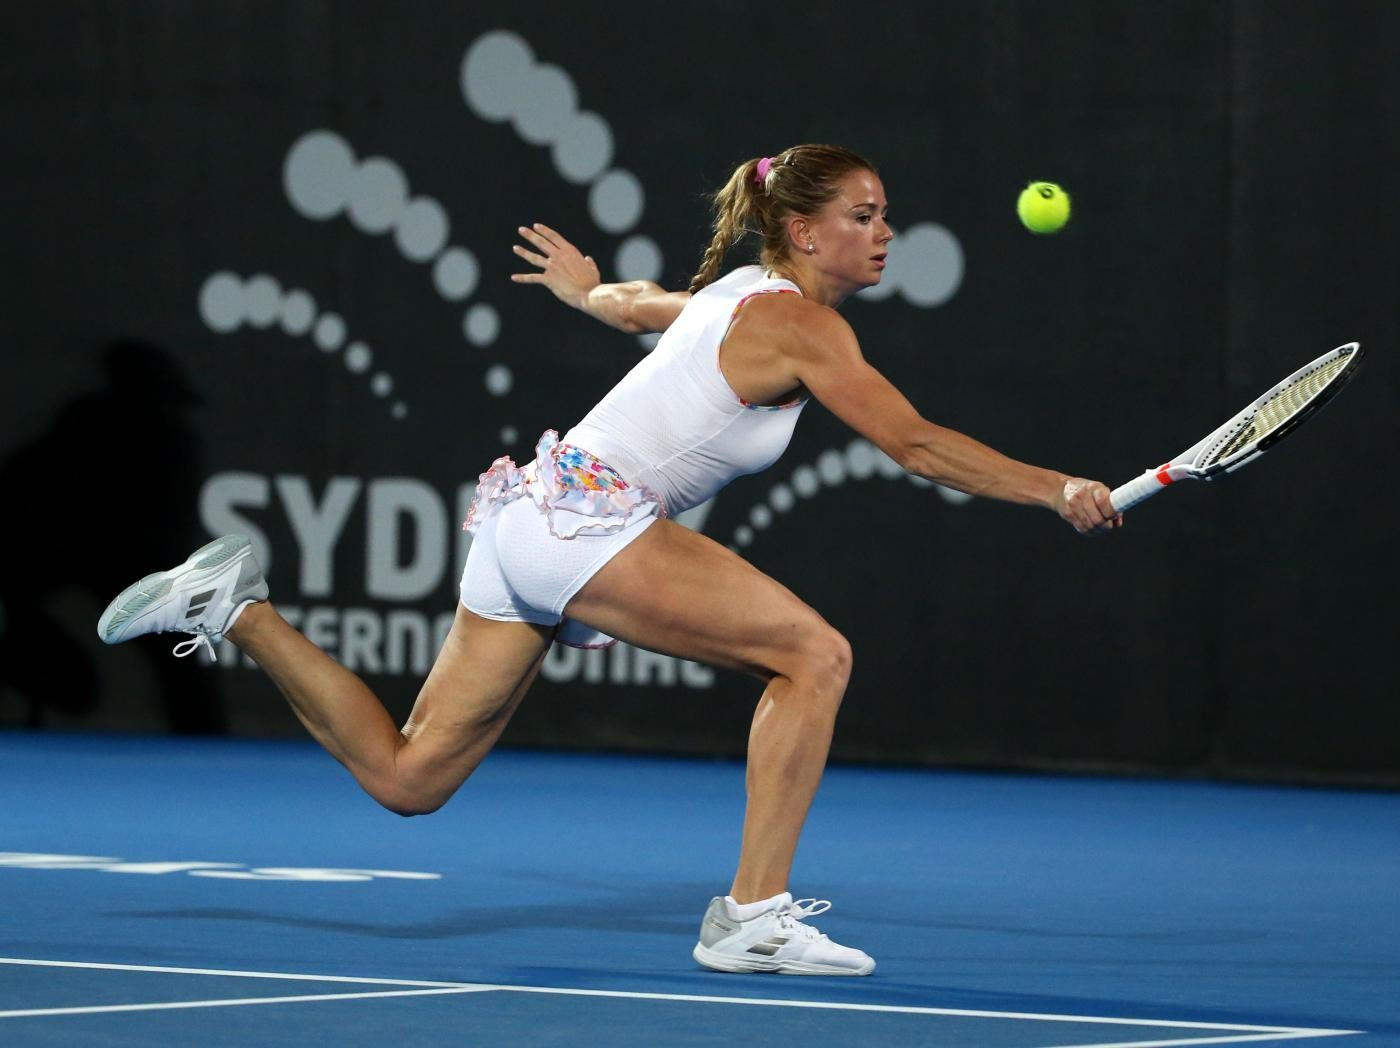 Tennis, Camila Giorgi, si batte ma perde con Angelique Kerber